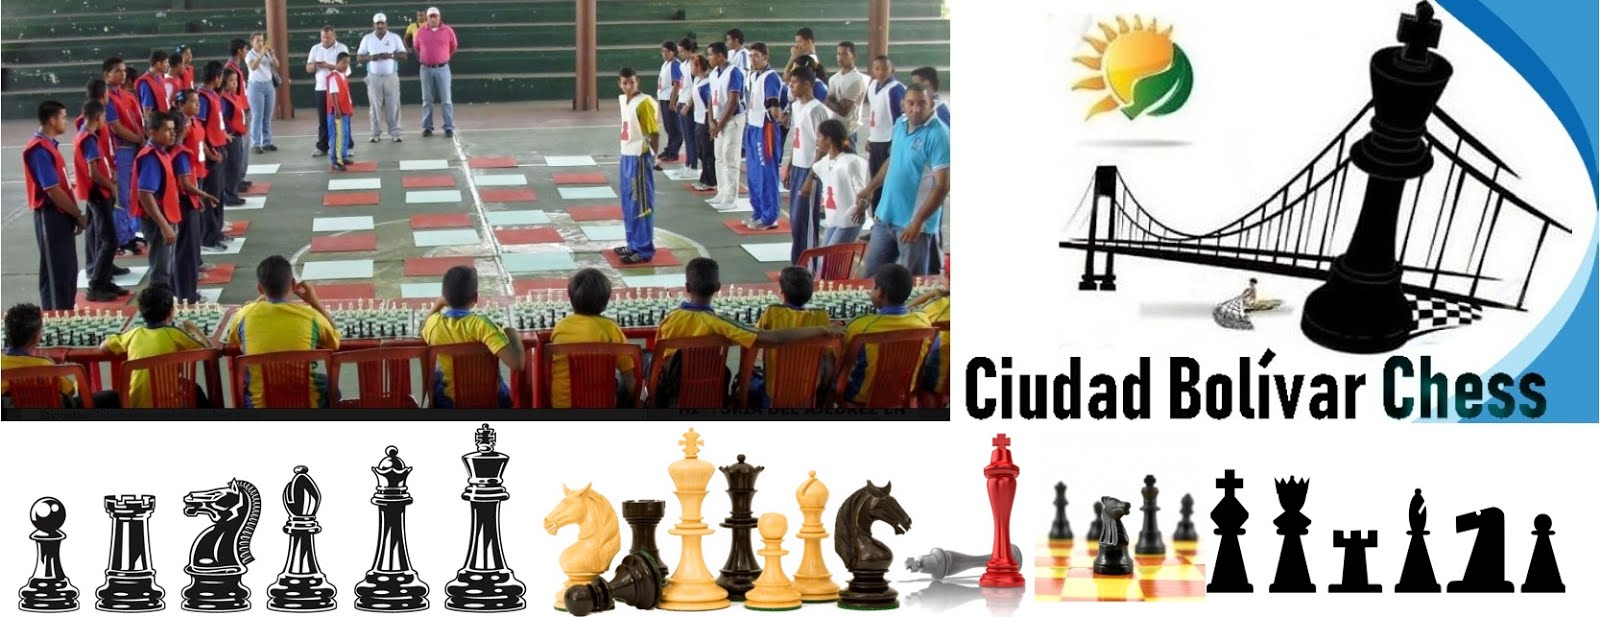 CIUDAD BOLÍVAR CHESS